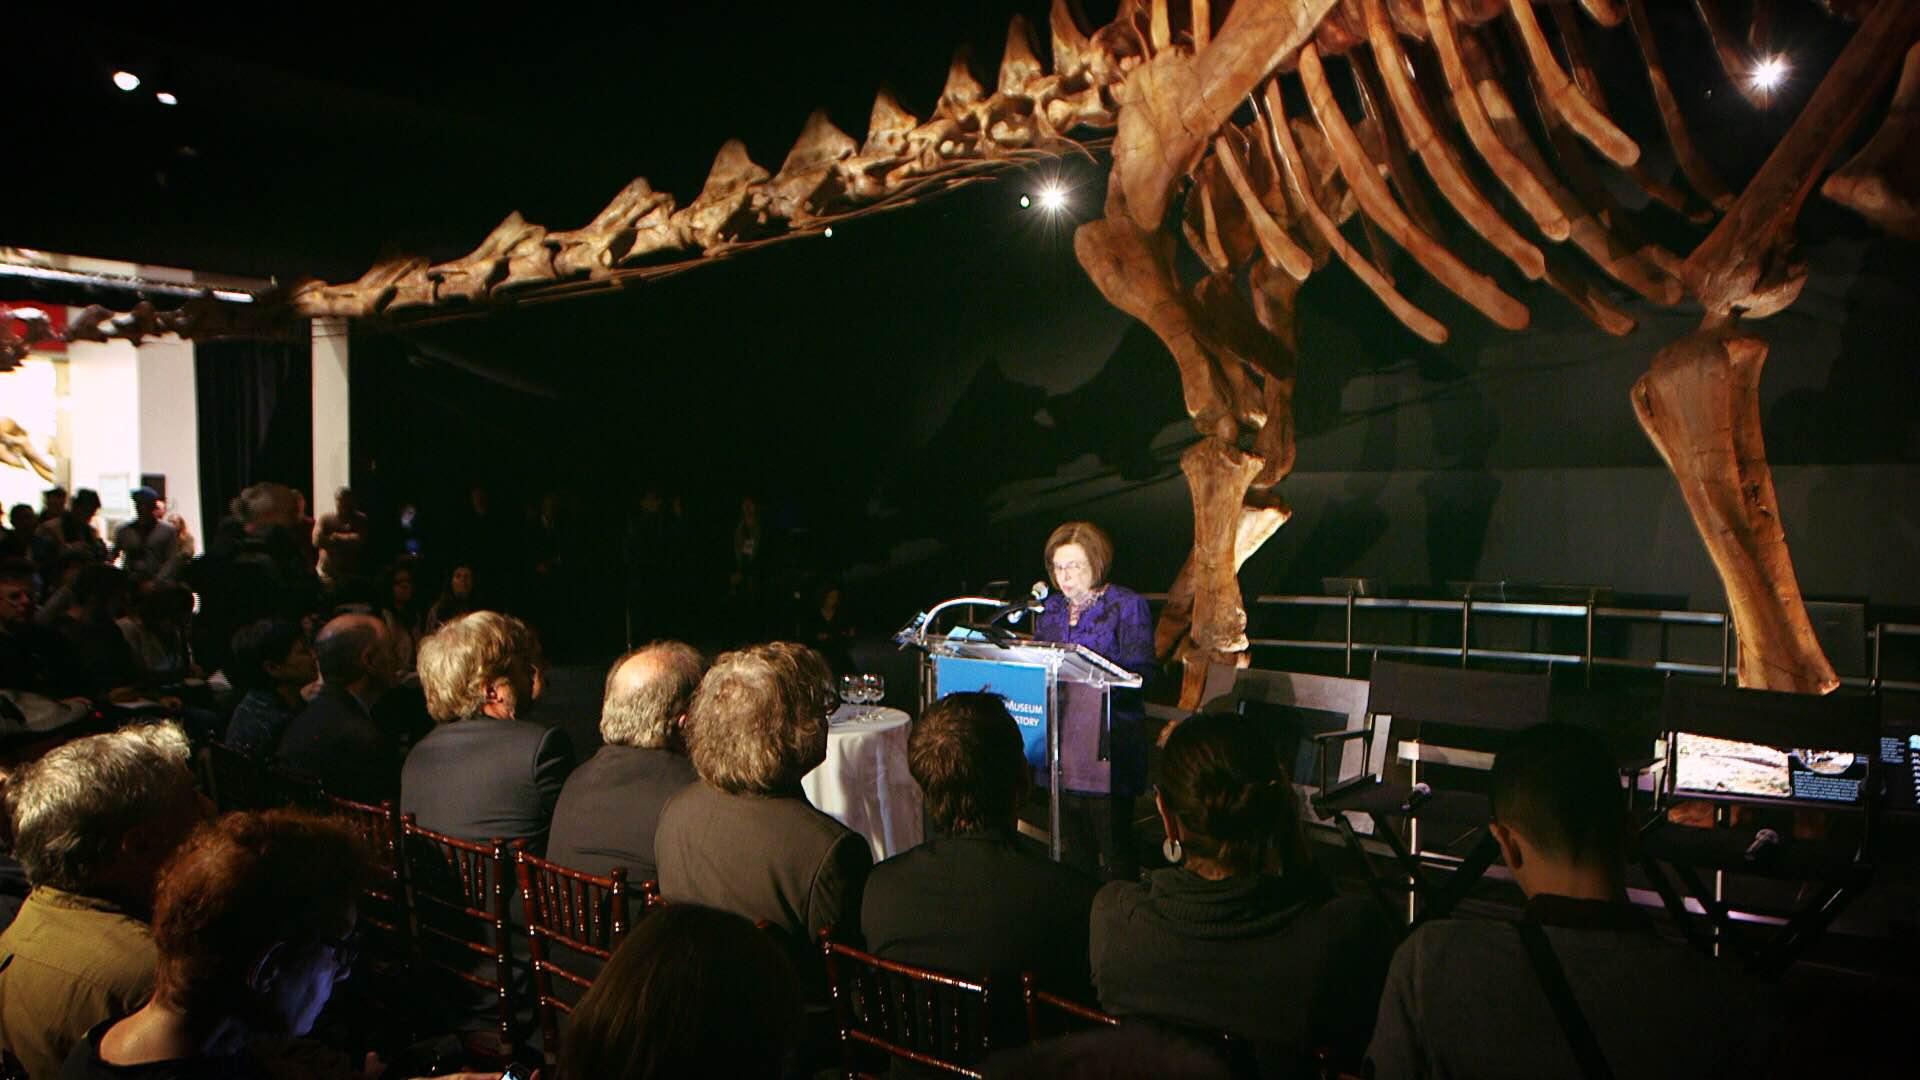 IMG 5089 2 New York City Crew Roars with Titanosaurus Rex at Museum